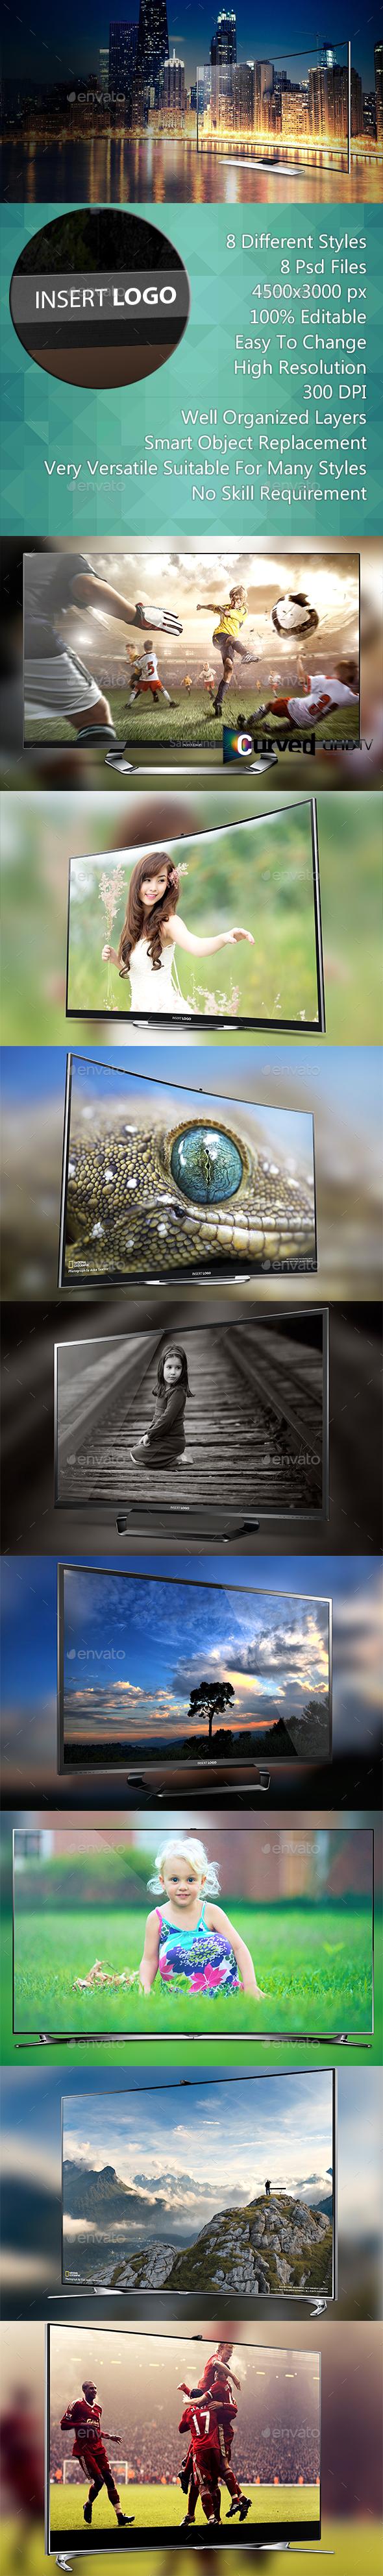 Smart Screen Mockup - UHD TV - TV Displays